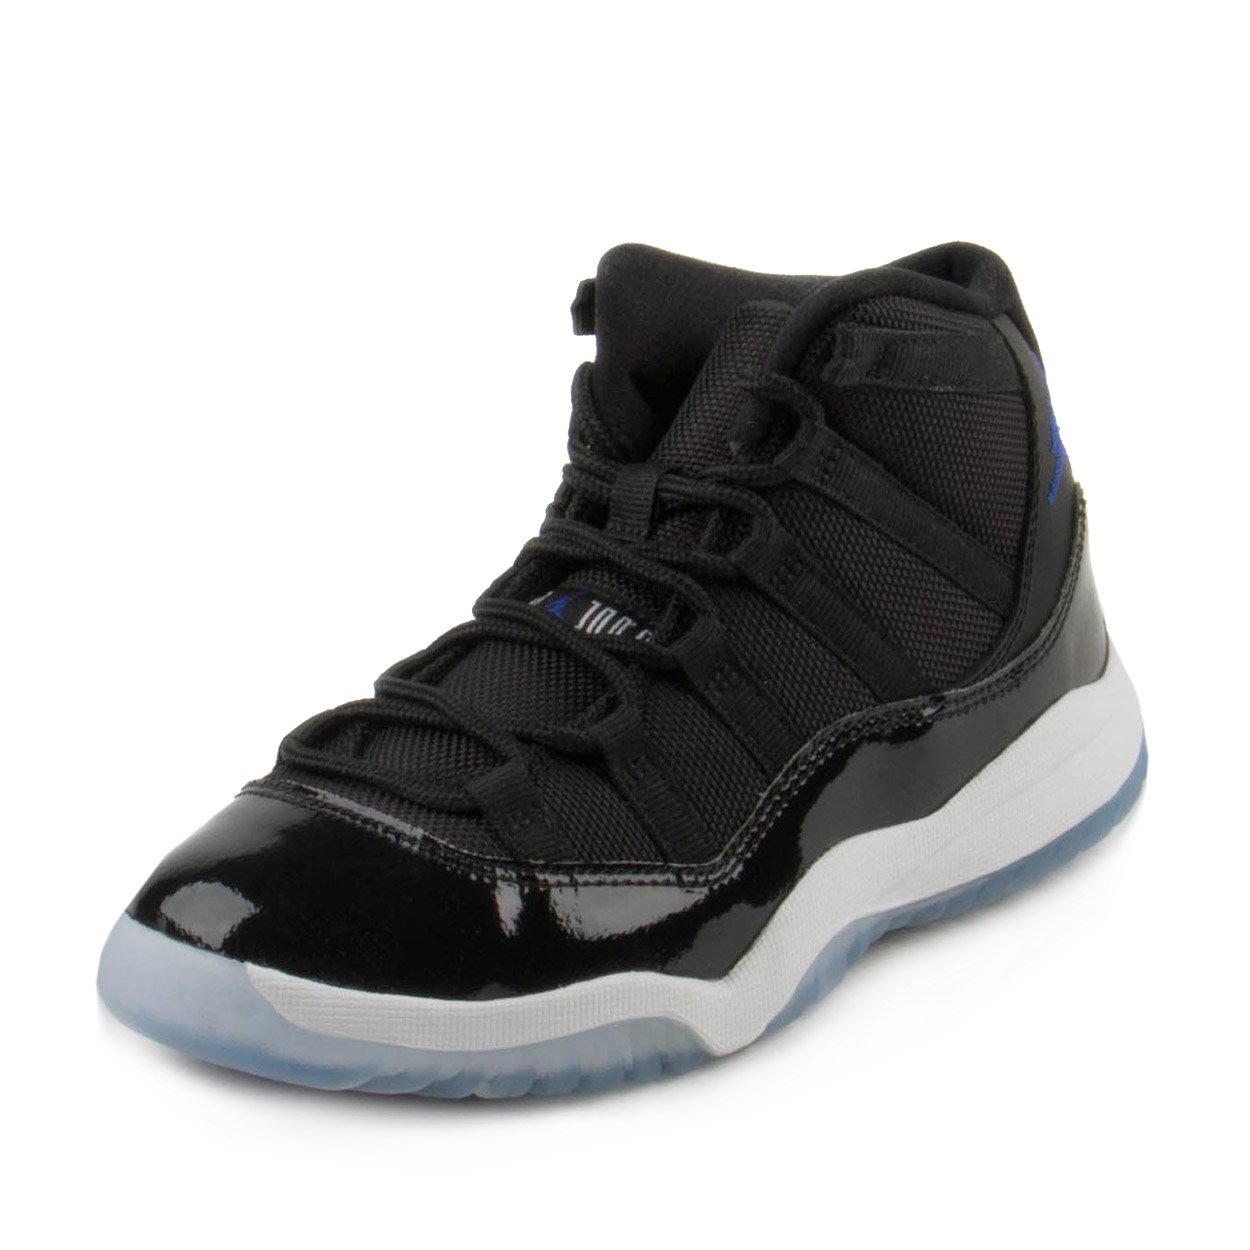 Nike Baby Boys Jordan 11 Retro BP ''Space Jam'' Black/Concord-White Leather Size 13.5C